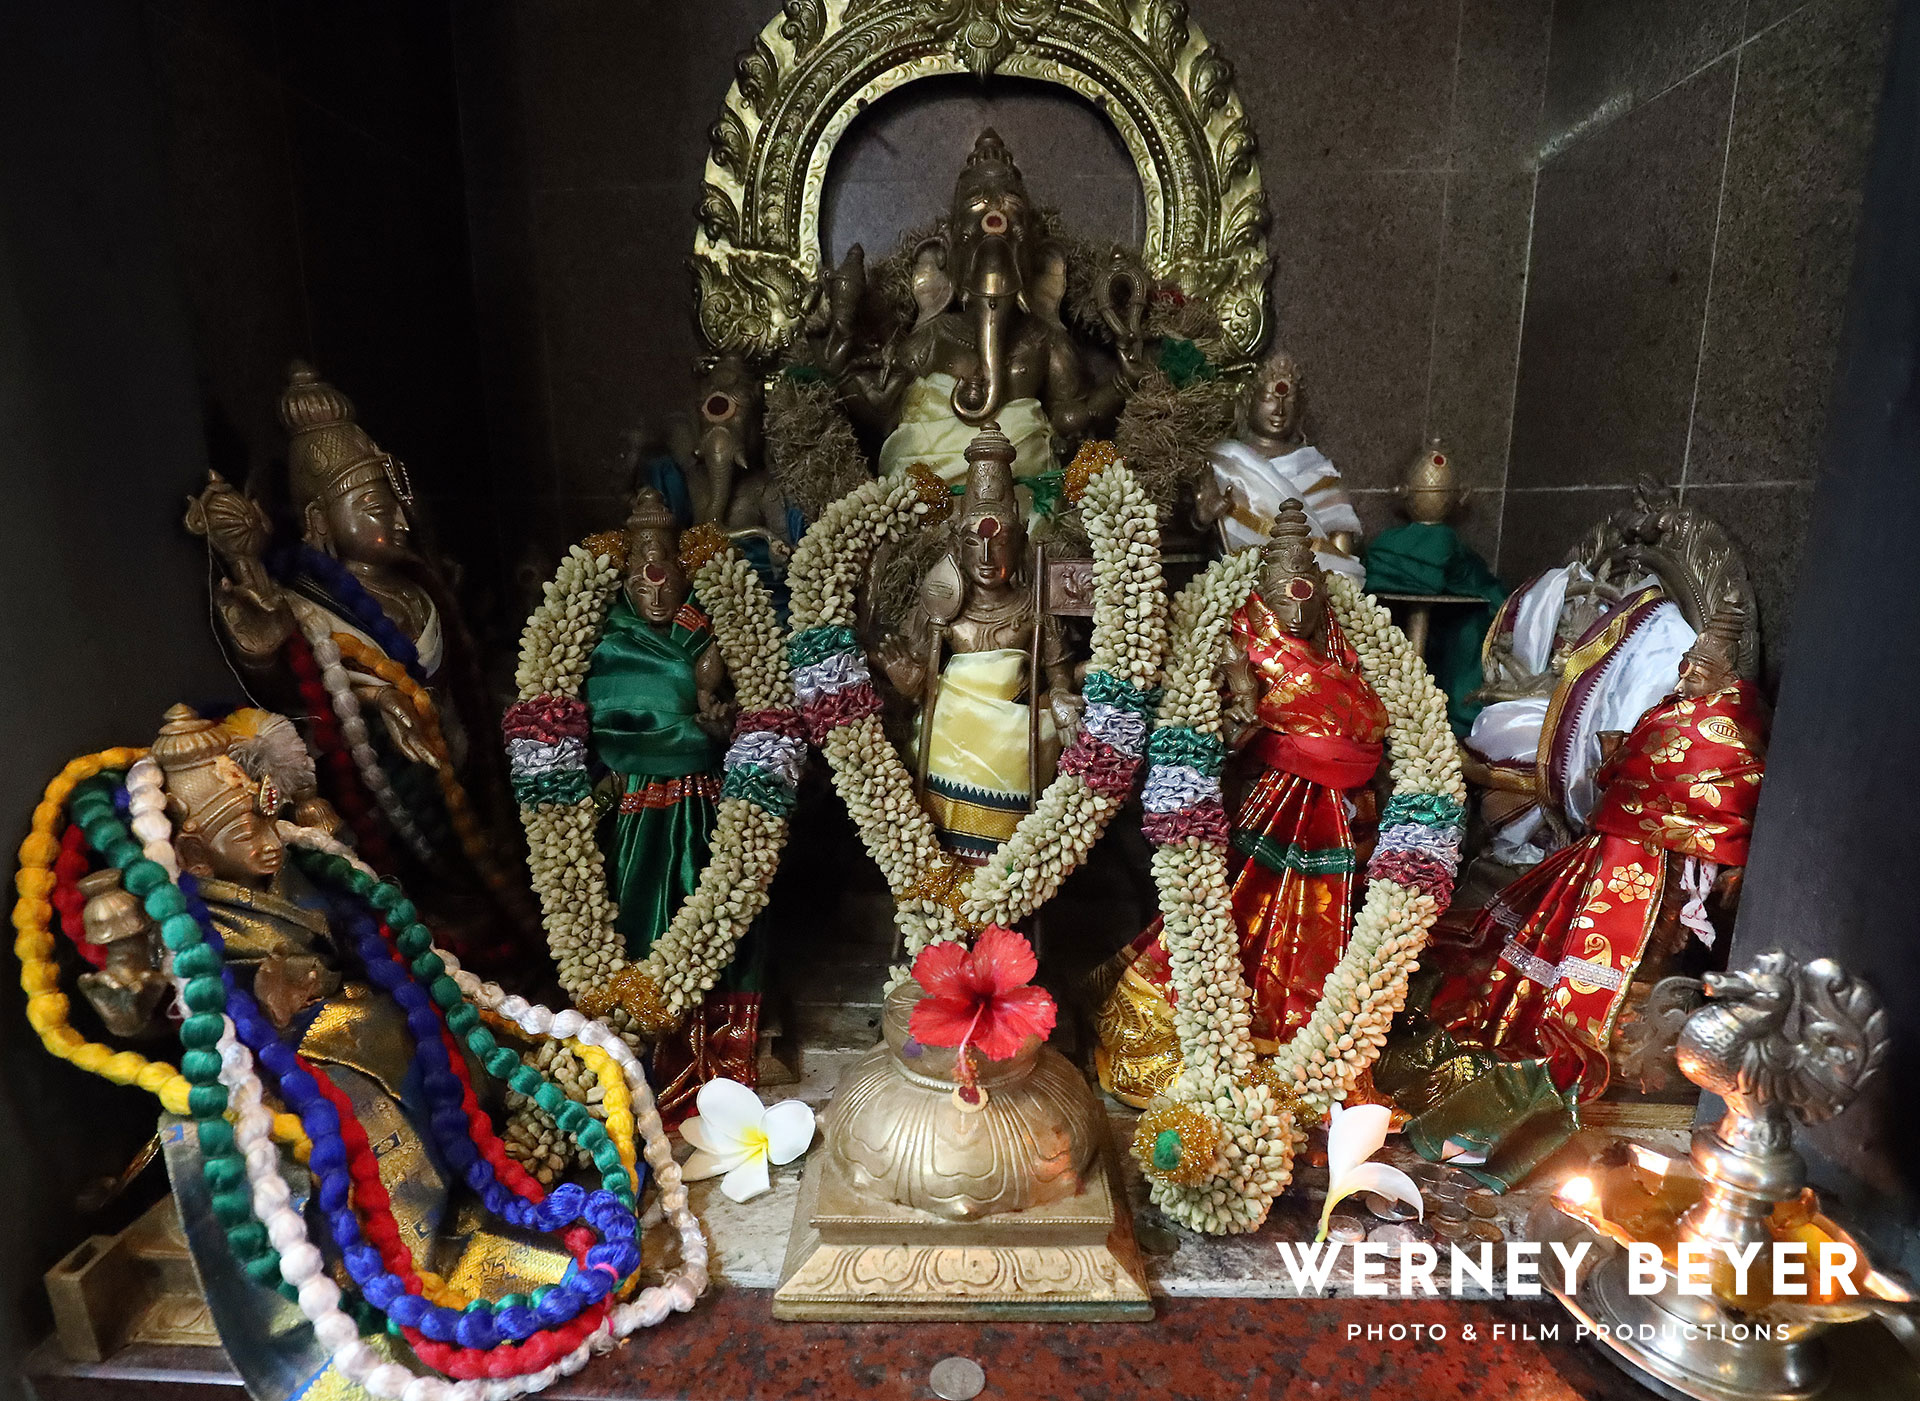 Impressions of Hinduism, Seychelles